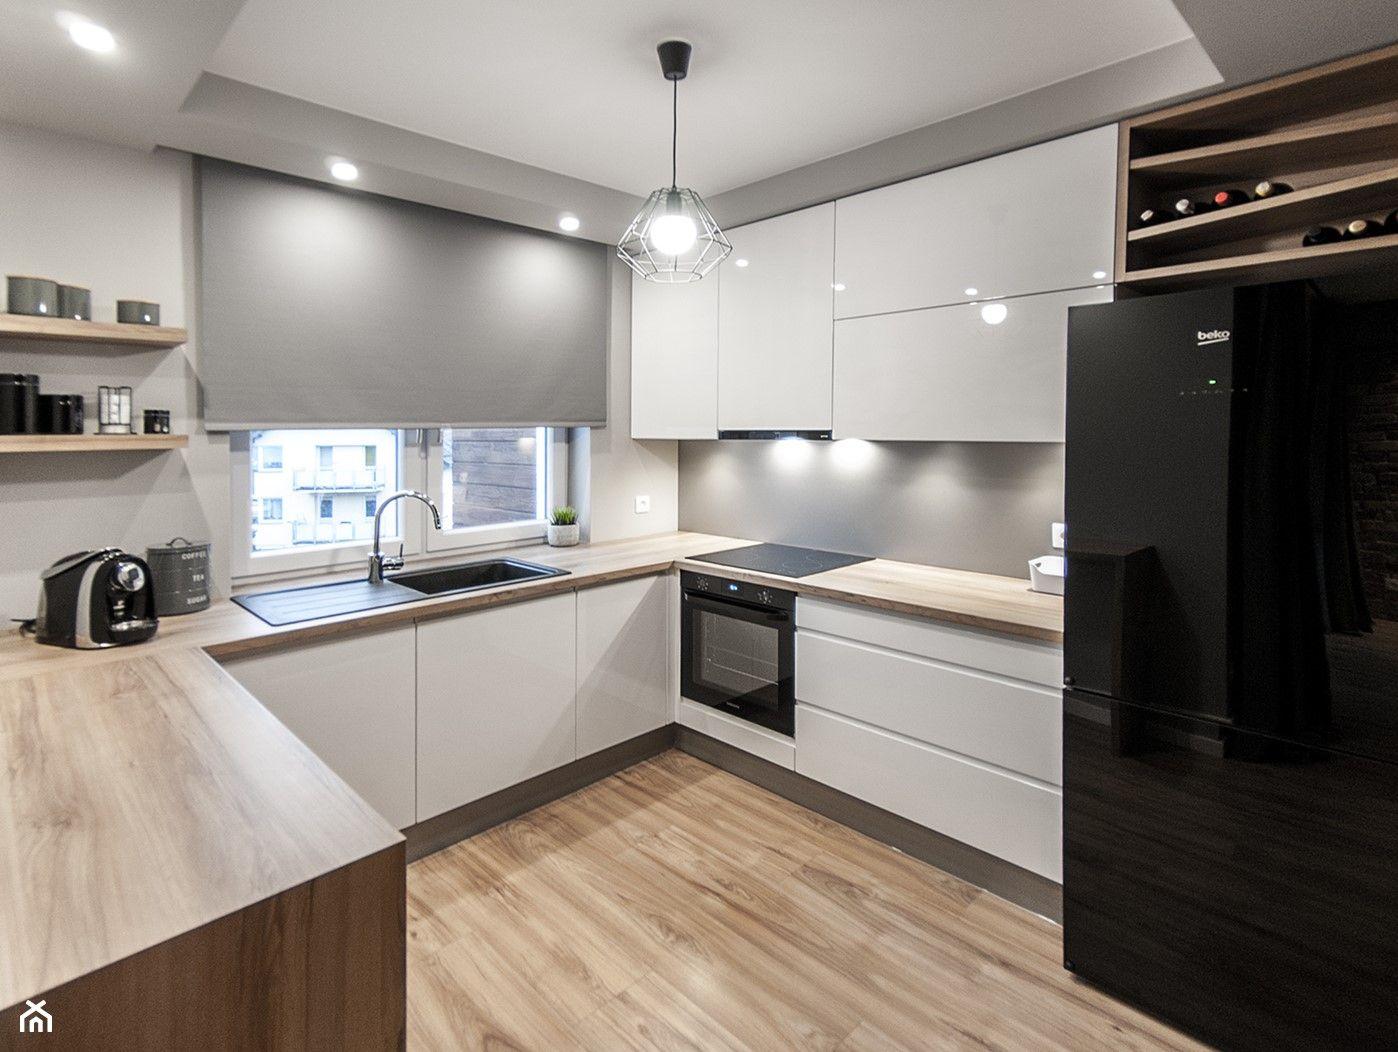 Kuchnia Styl Nowoczesny Interior Design Kitchen Kitchen Interior Kitchen Design